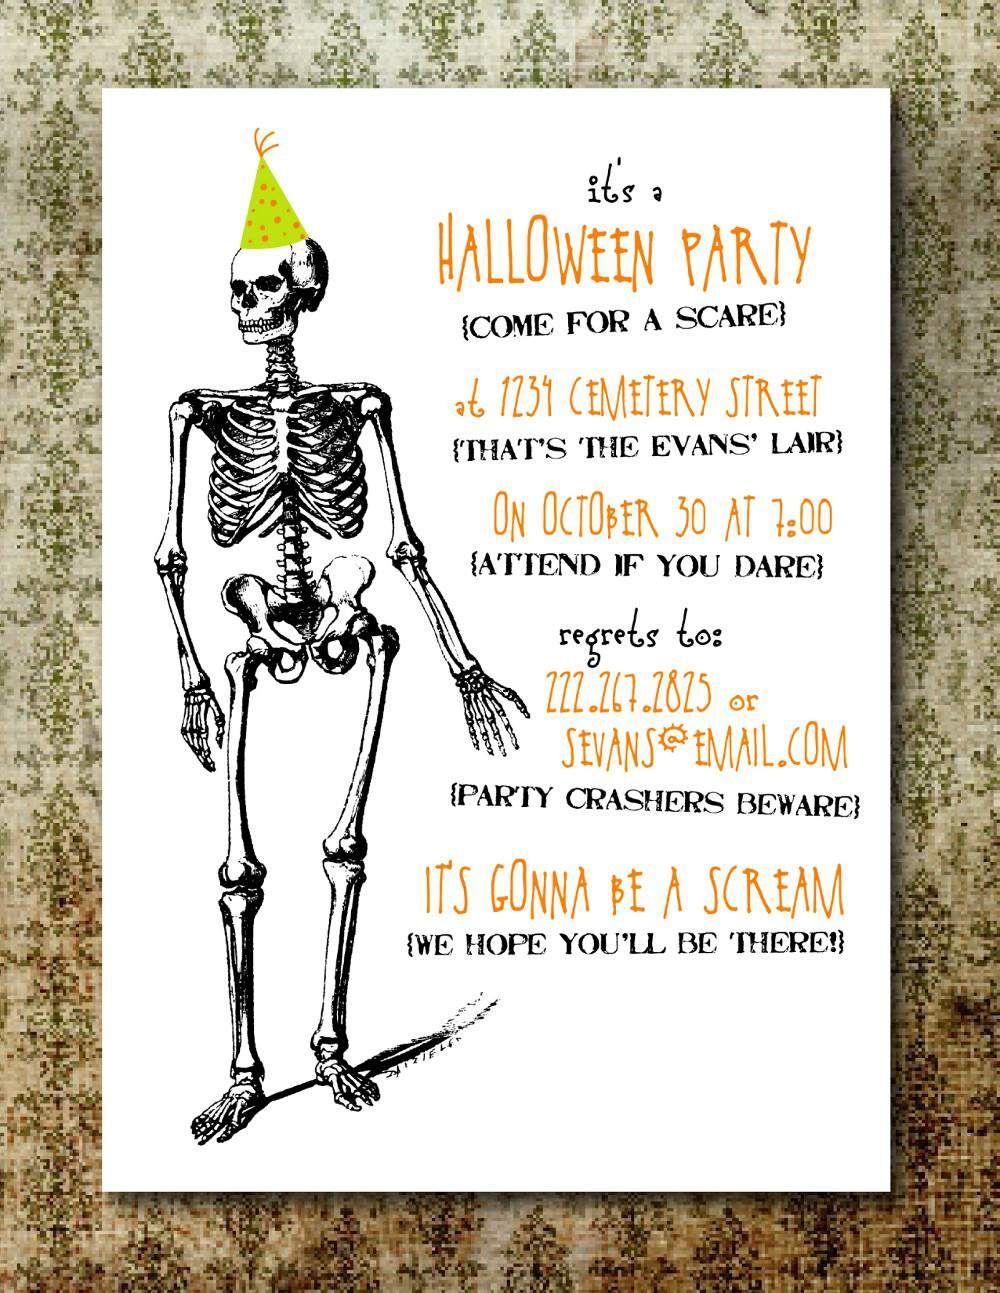 Free Printable Halloween Invitation Templates | Free Printable - Free Halloween Birthday Invitation Templates Printable